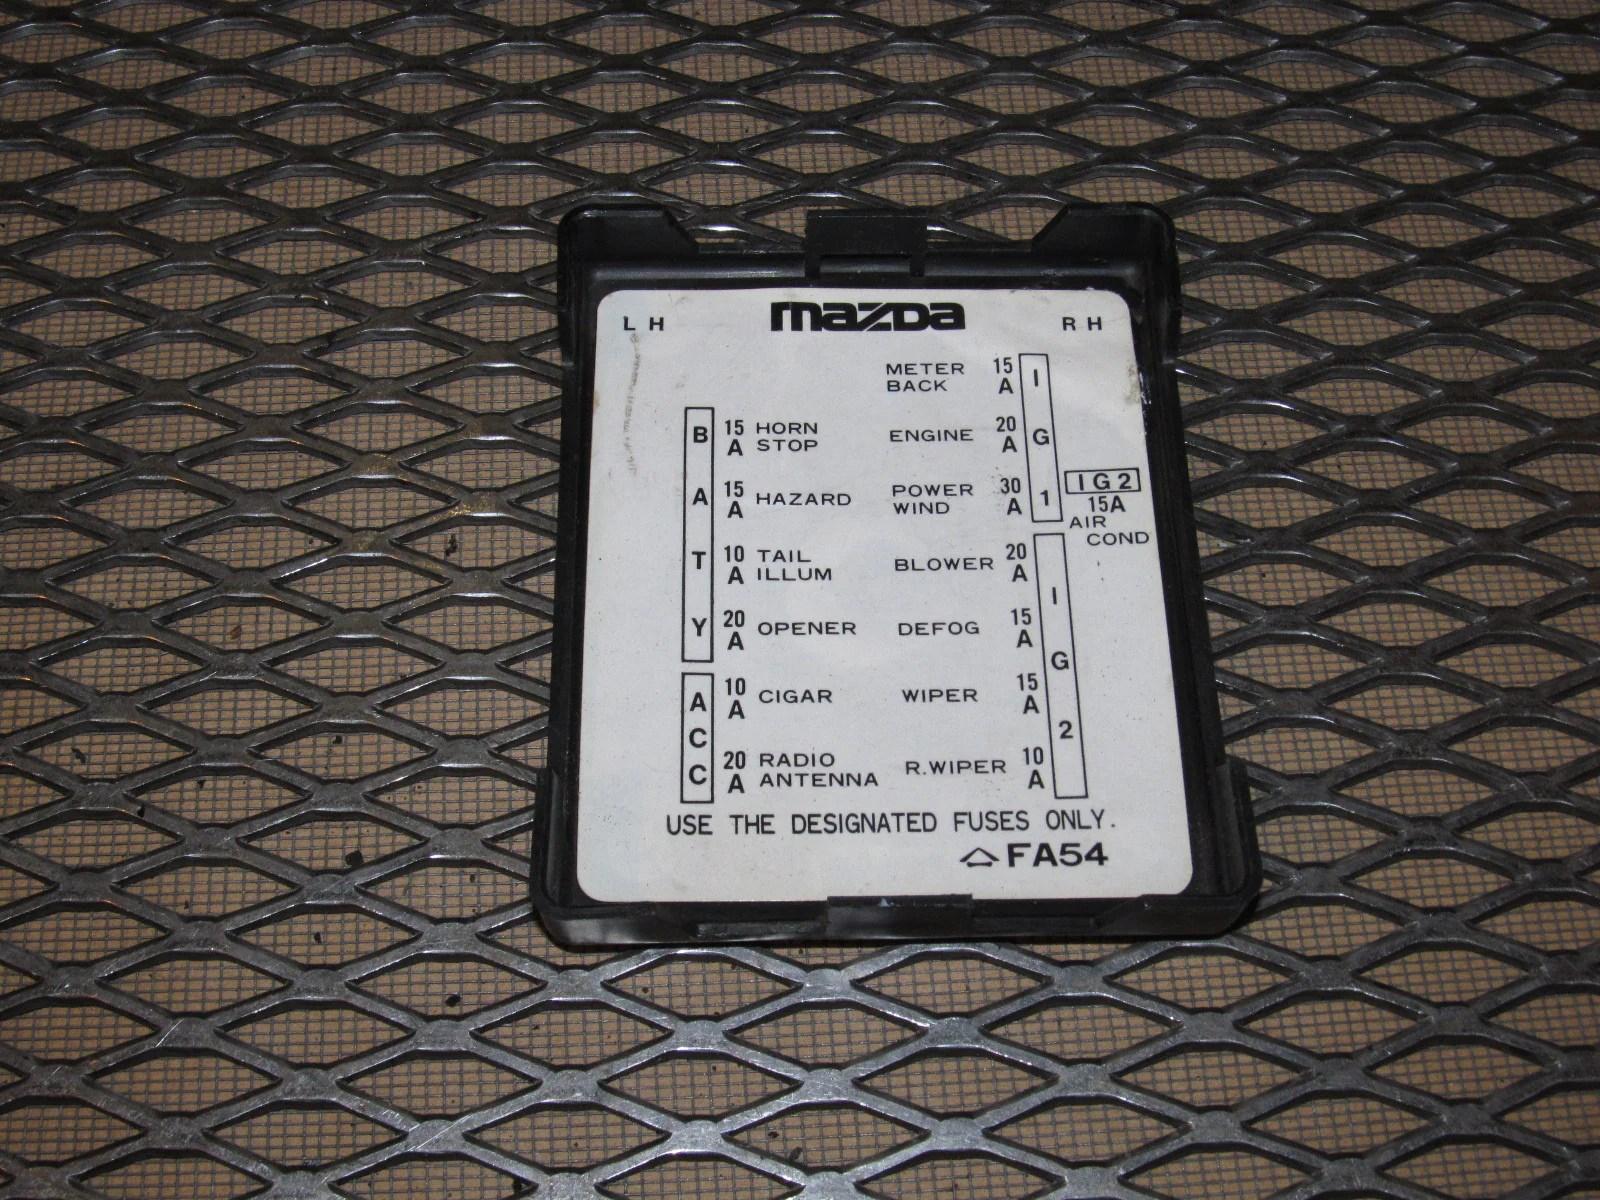 rx7 fuse box diagram wiring diagram 1986 mazda rx7 fuse box diagram [ 1600 x 1200 Pixel ]